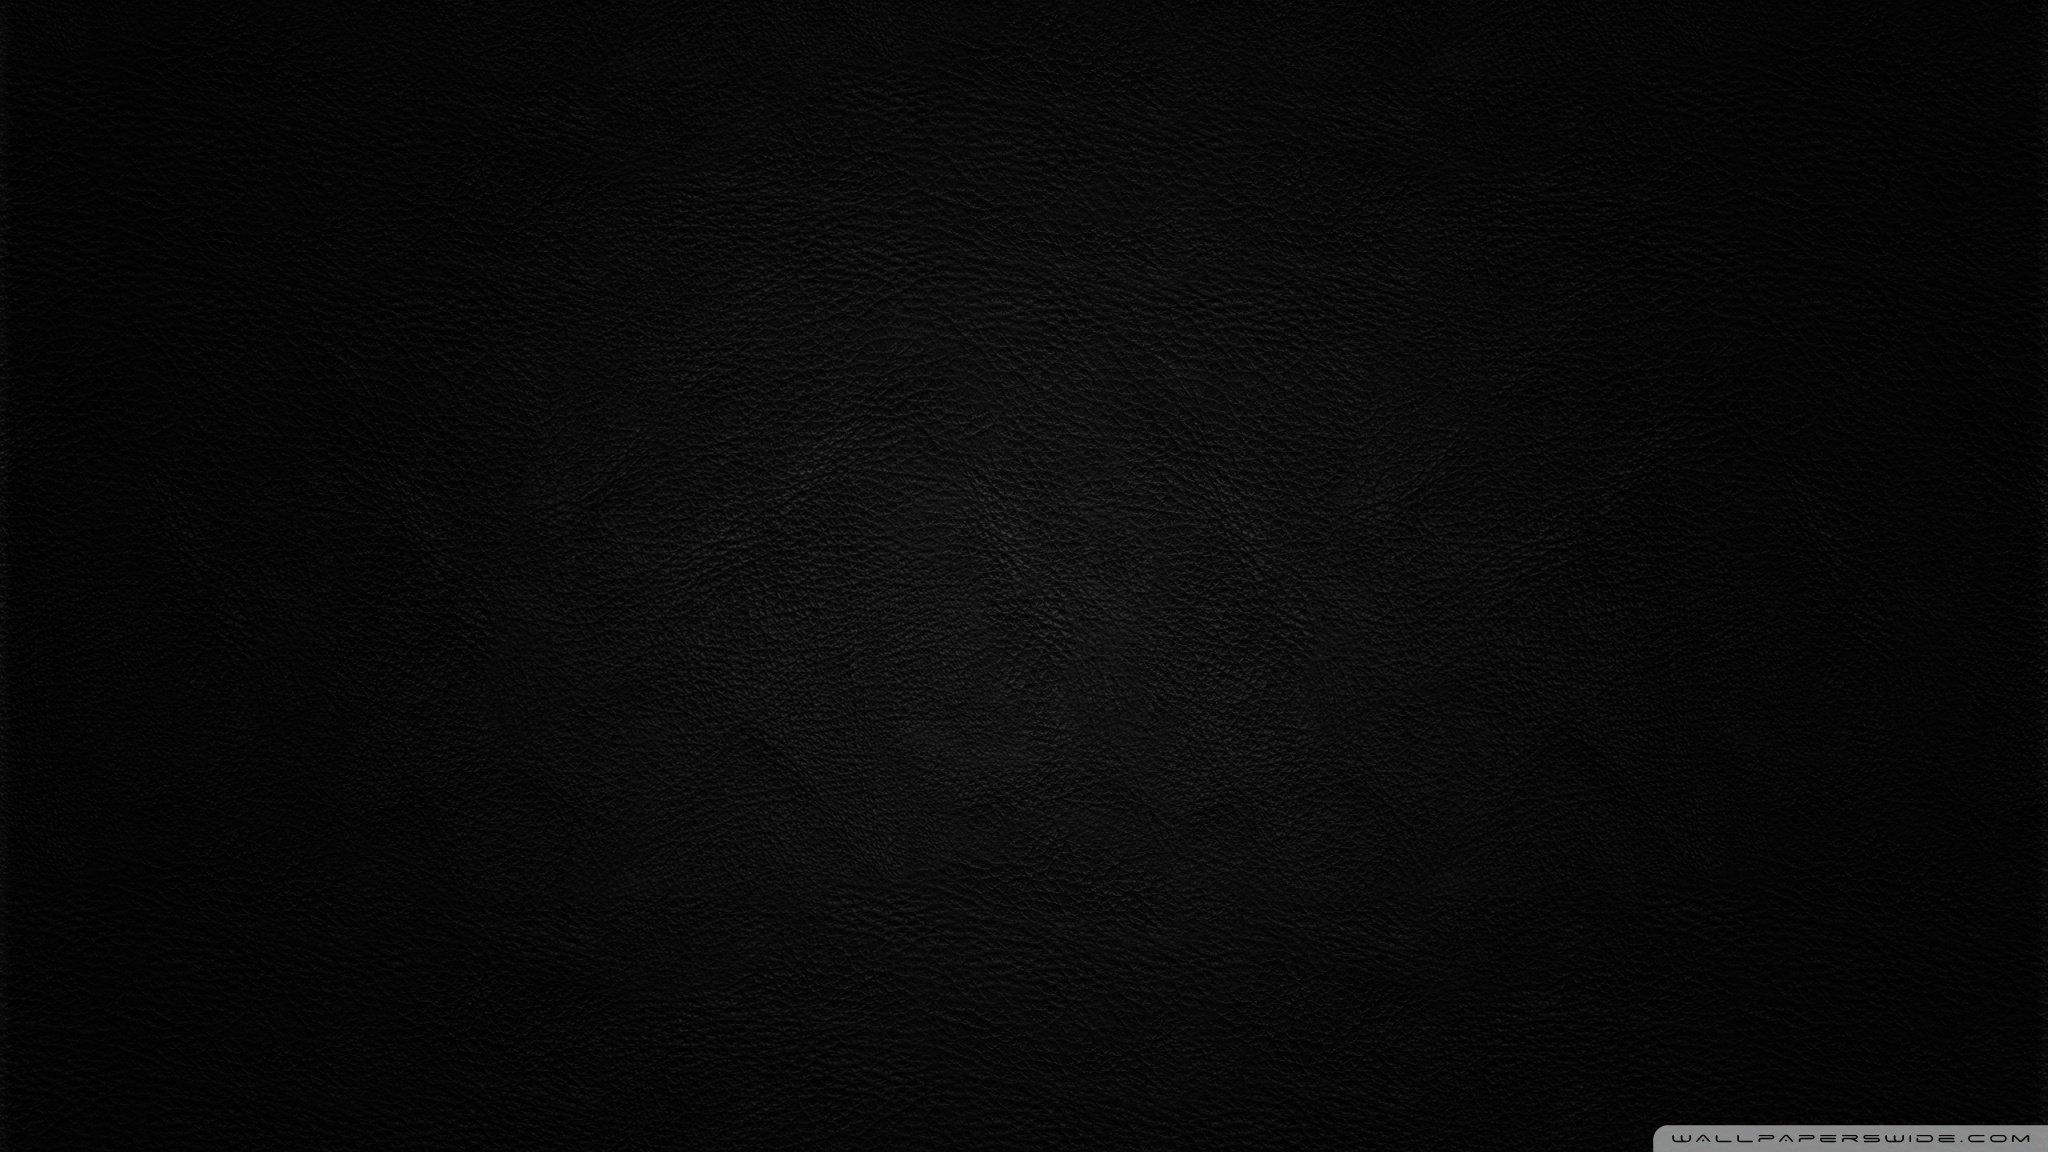 46 2048x1152 Gaming Wallpaper On Wallpapersafari